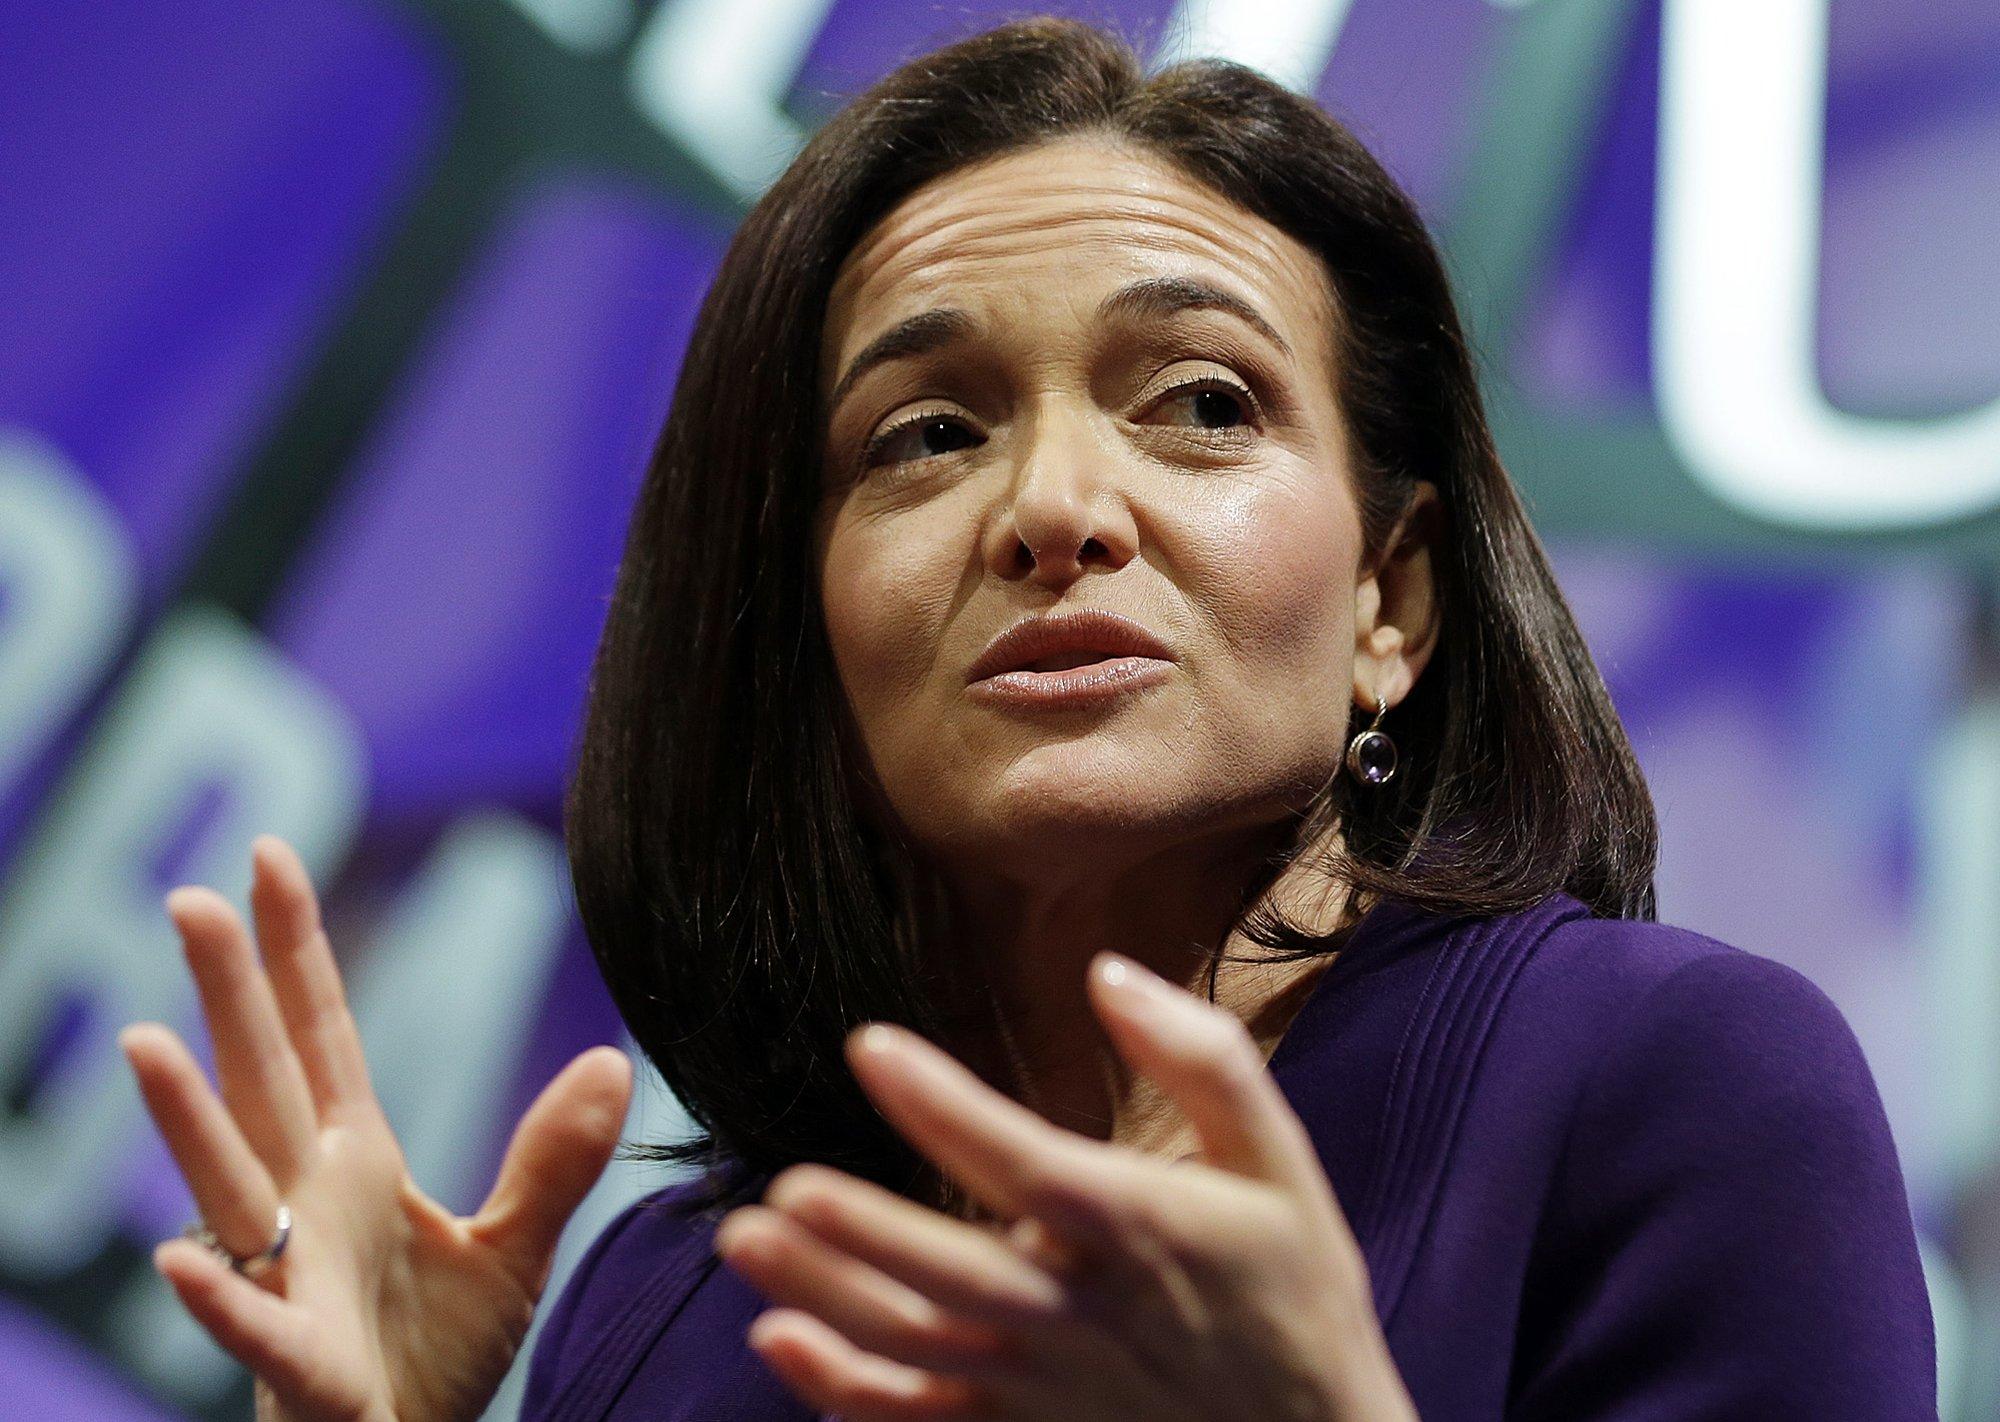 Facebook's-Sandberg-'Leans-Into'-Russia-Probe